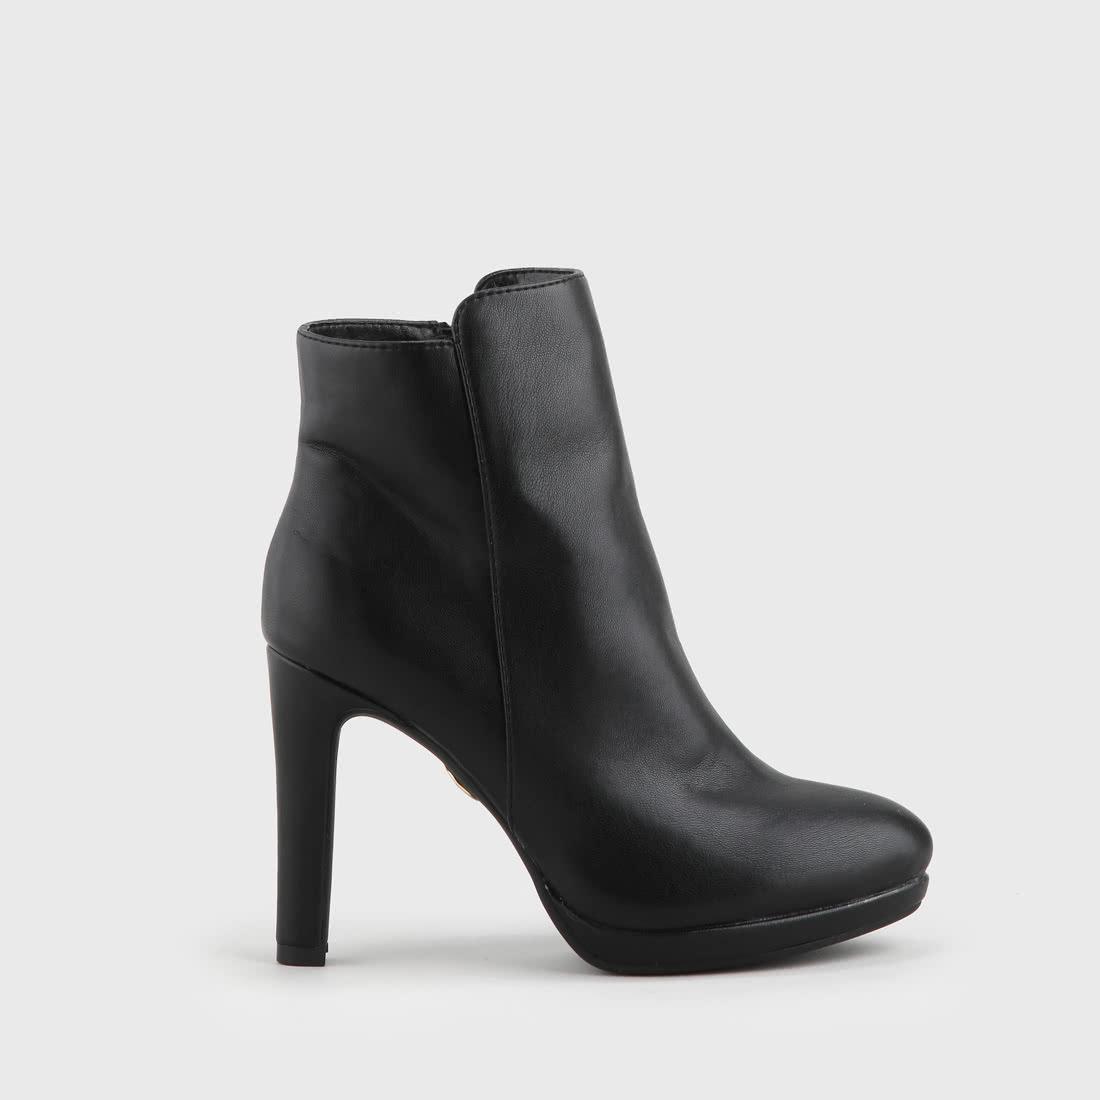 buffalo ankle boot ziernaht schwarz online kaufen buffalo. Black Bedroom Furniture Sets. Home Design Ideas